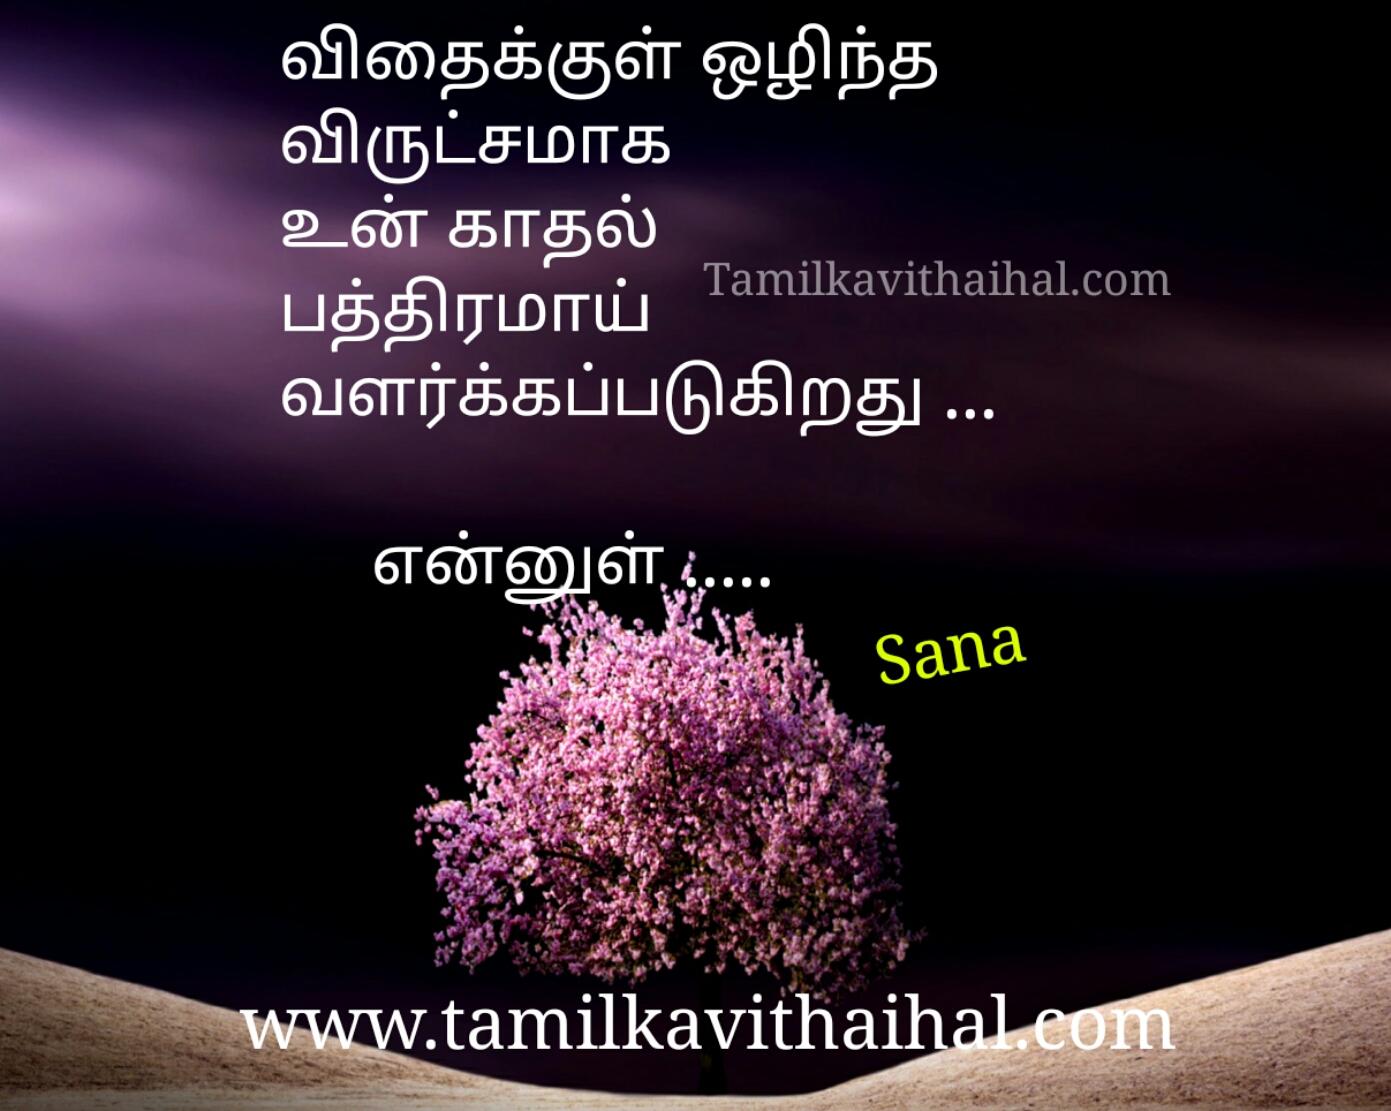 Cute love feel kadhal kavithaigal sana images pic